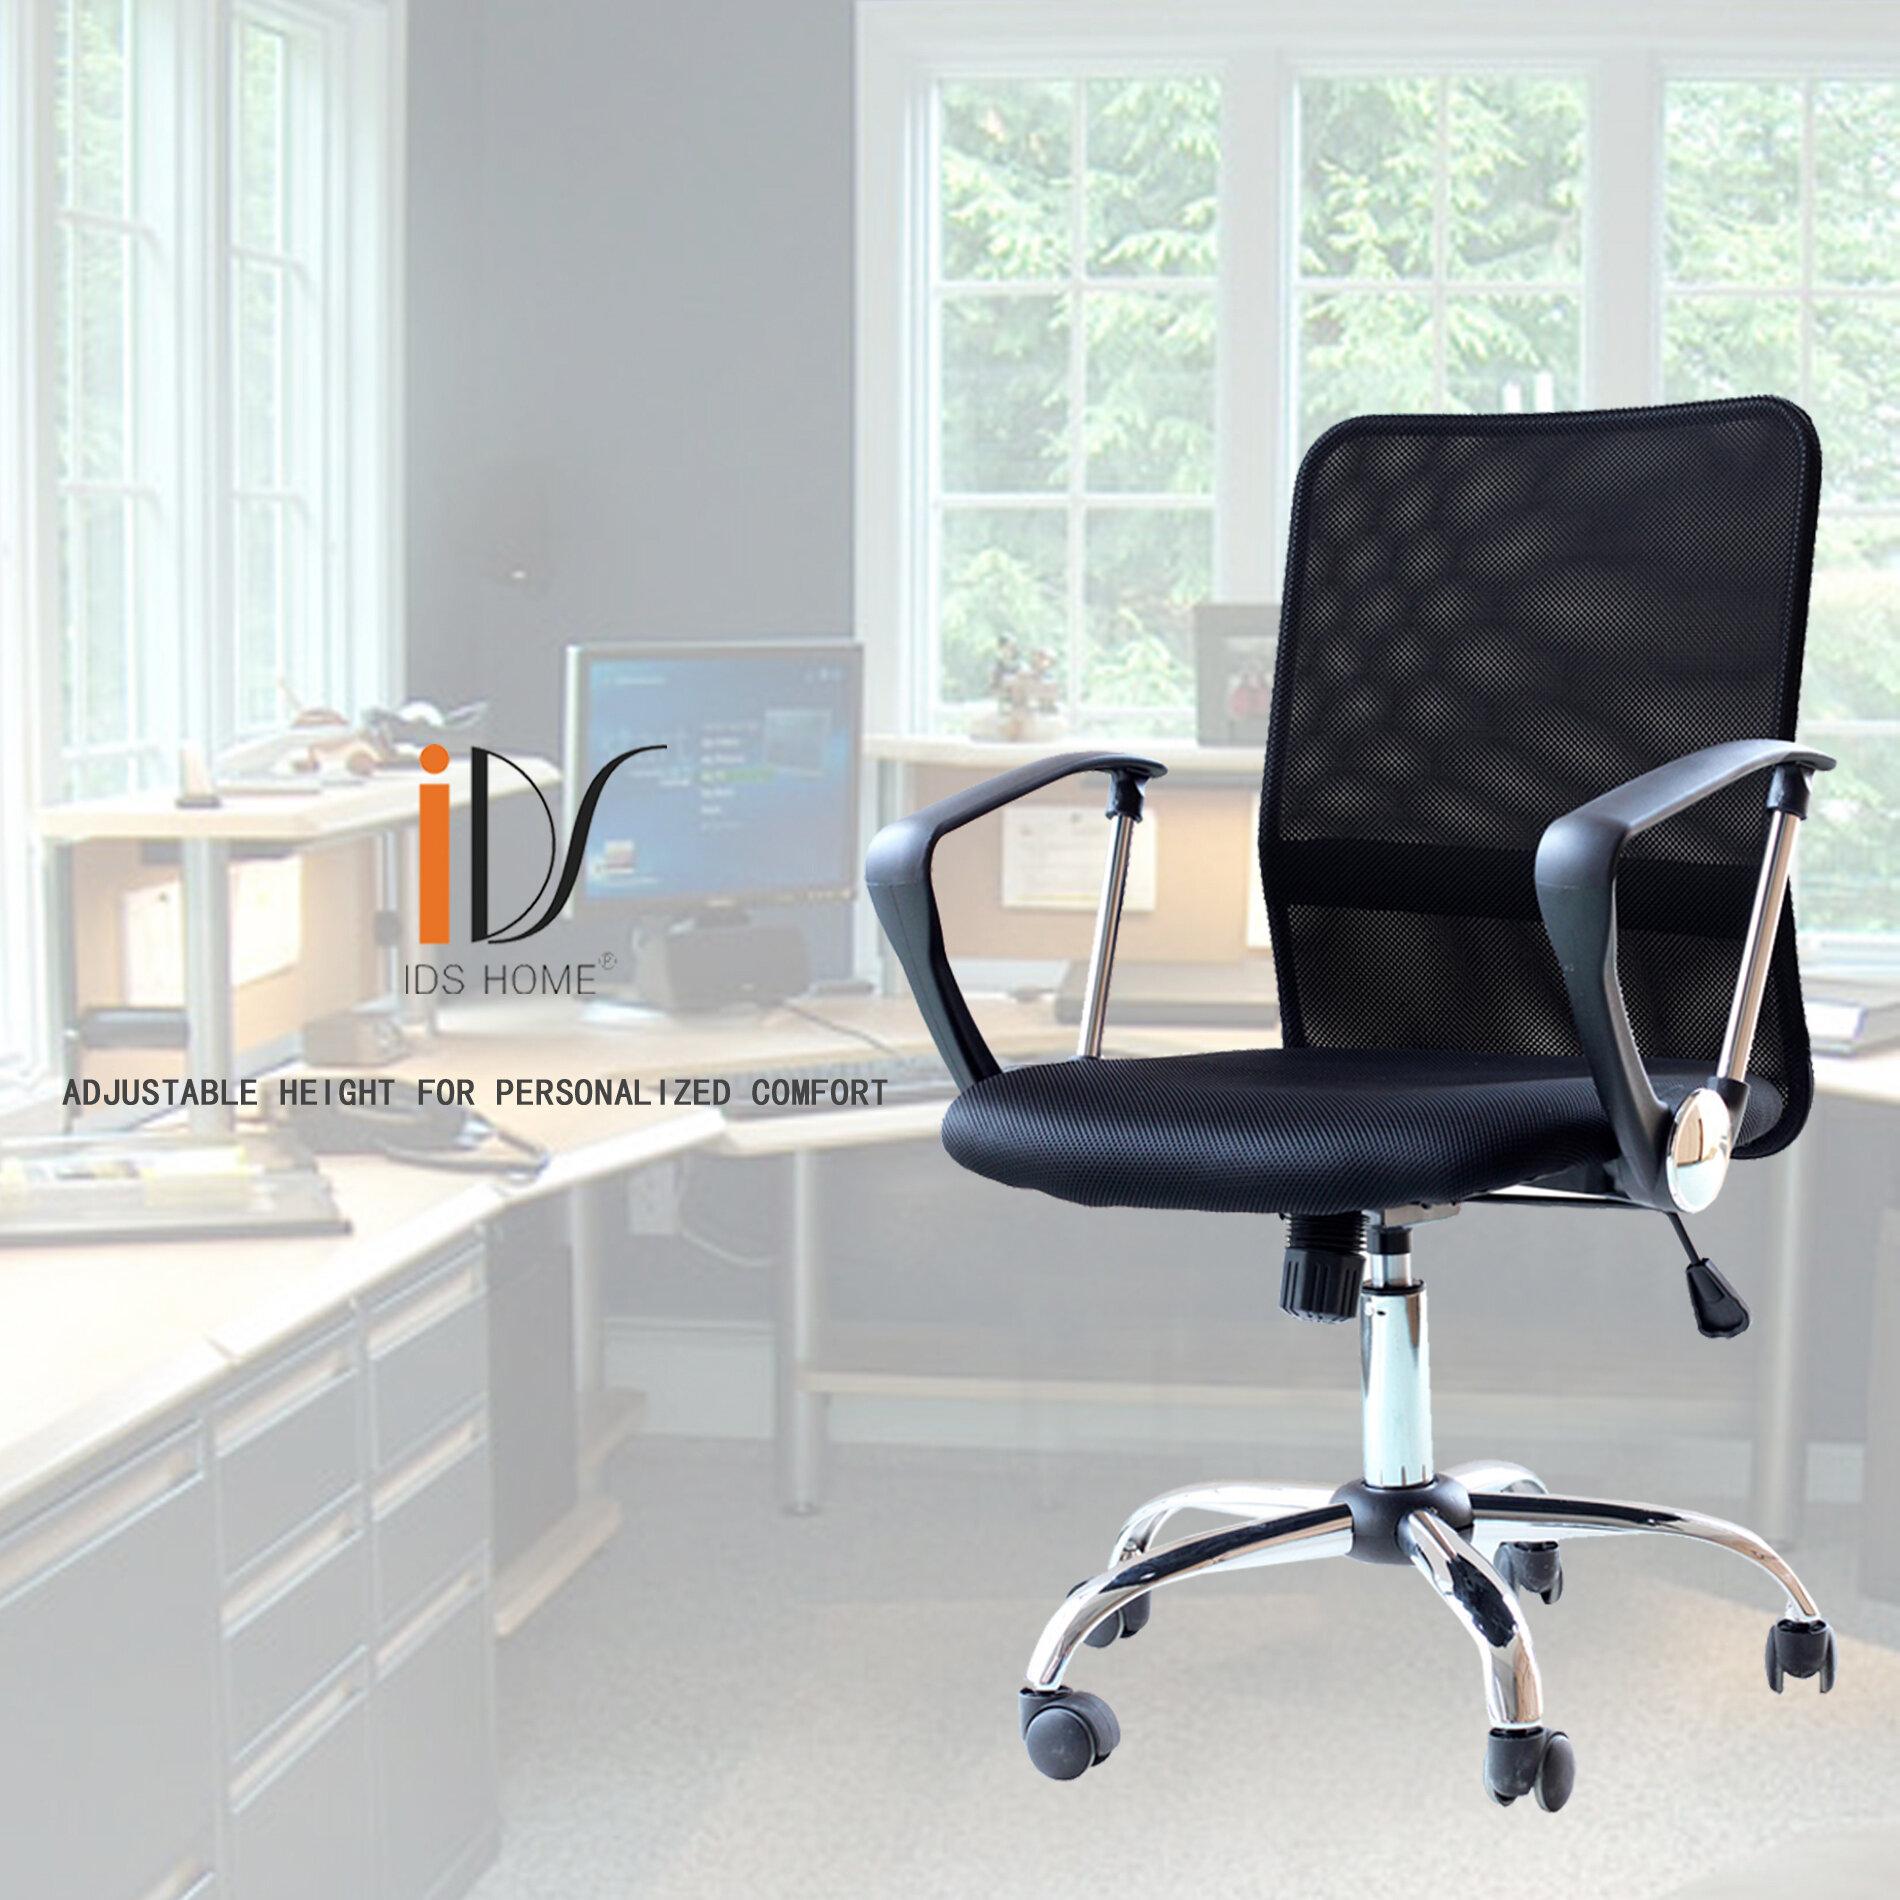 IDSOnlineCorp Ergonomic Mesh Mid Back Office Chair U0026 Reviews | Wayfair